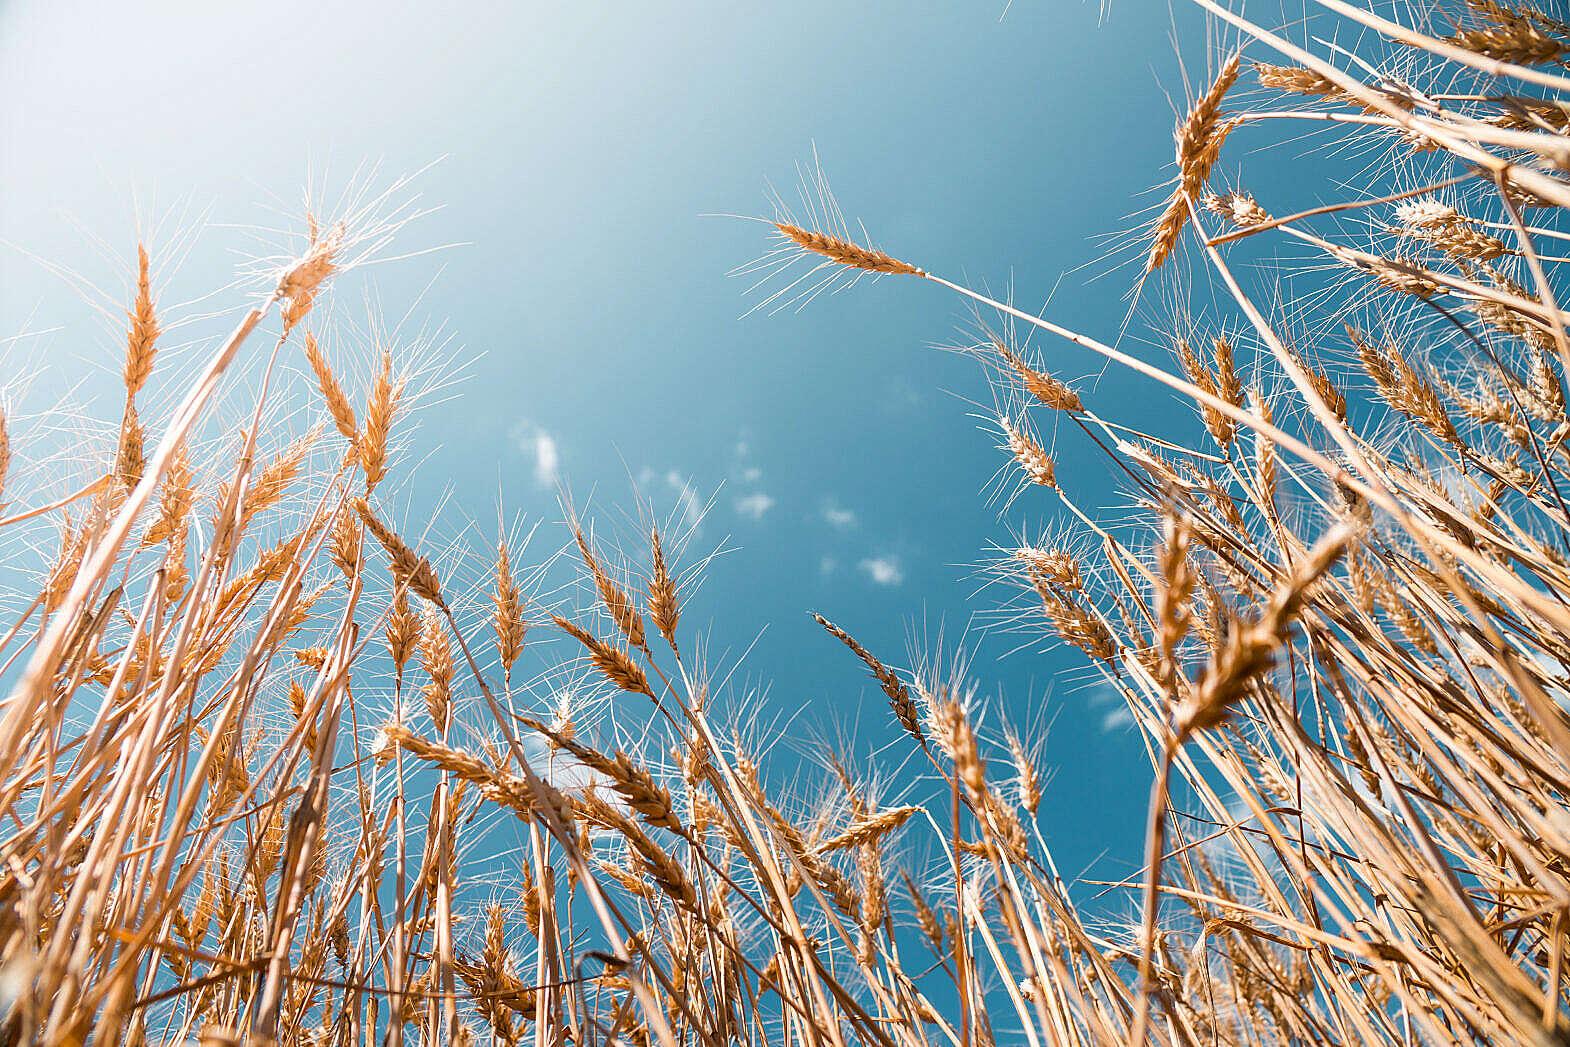 Grain Field Free Stock Photo Download